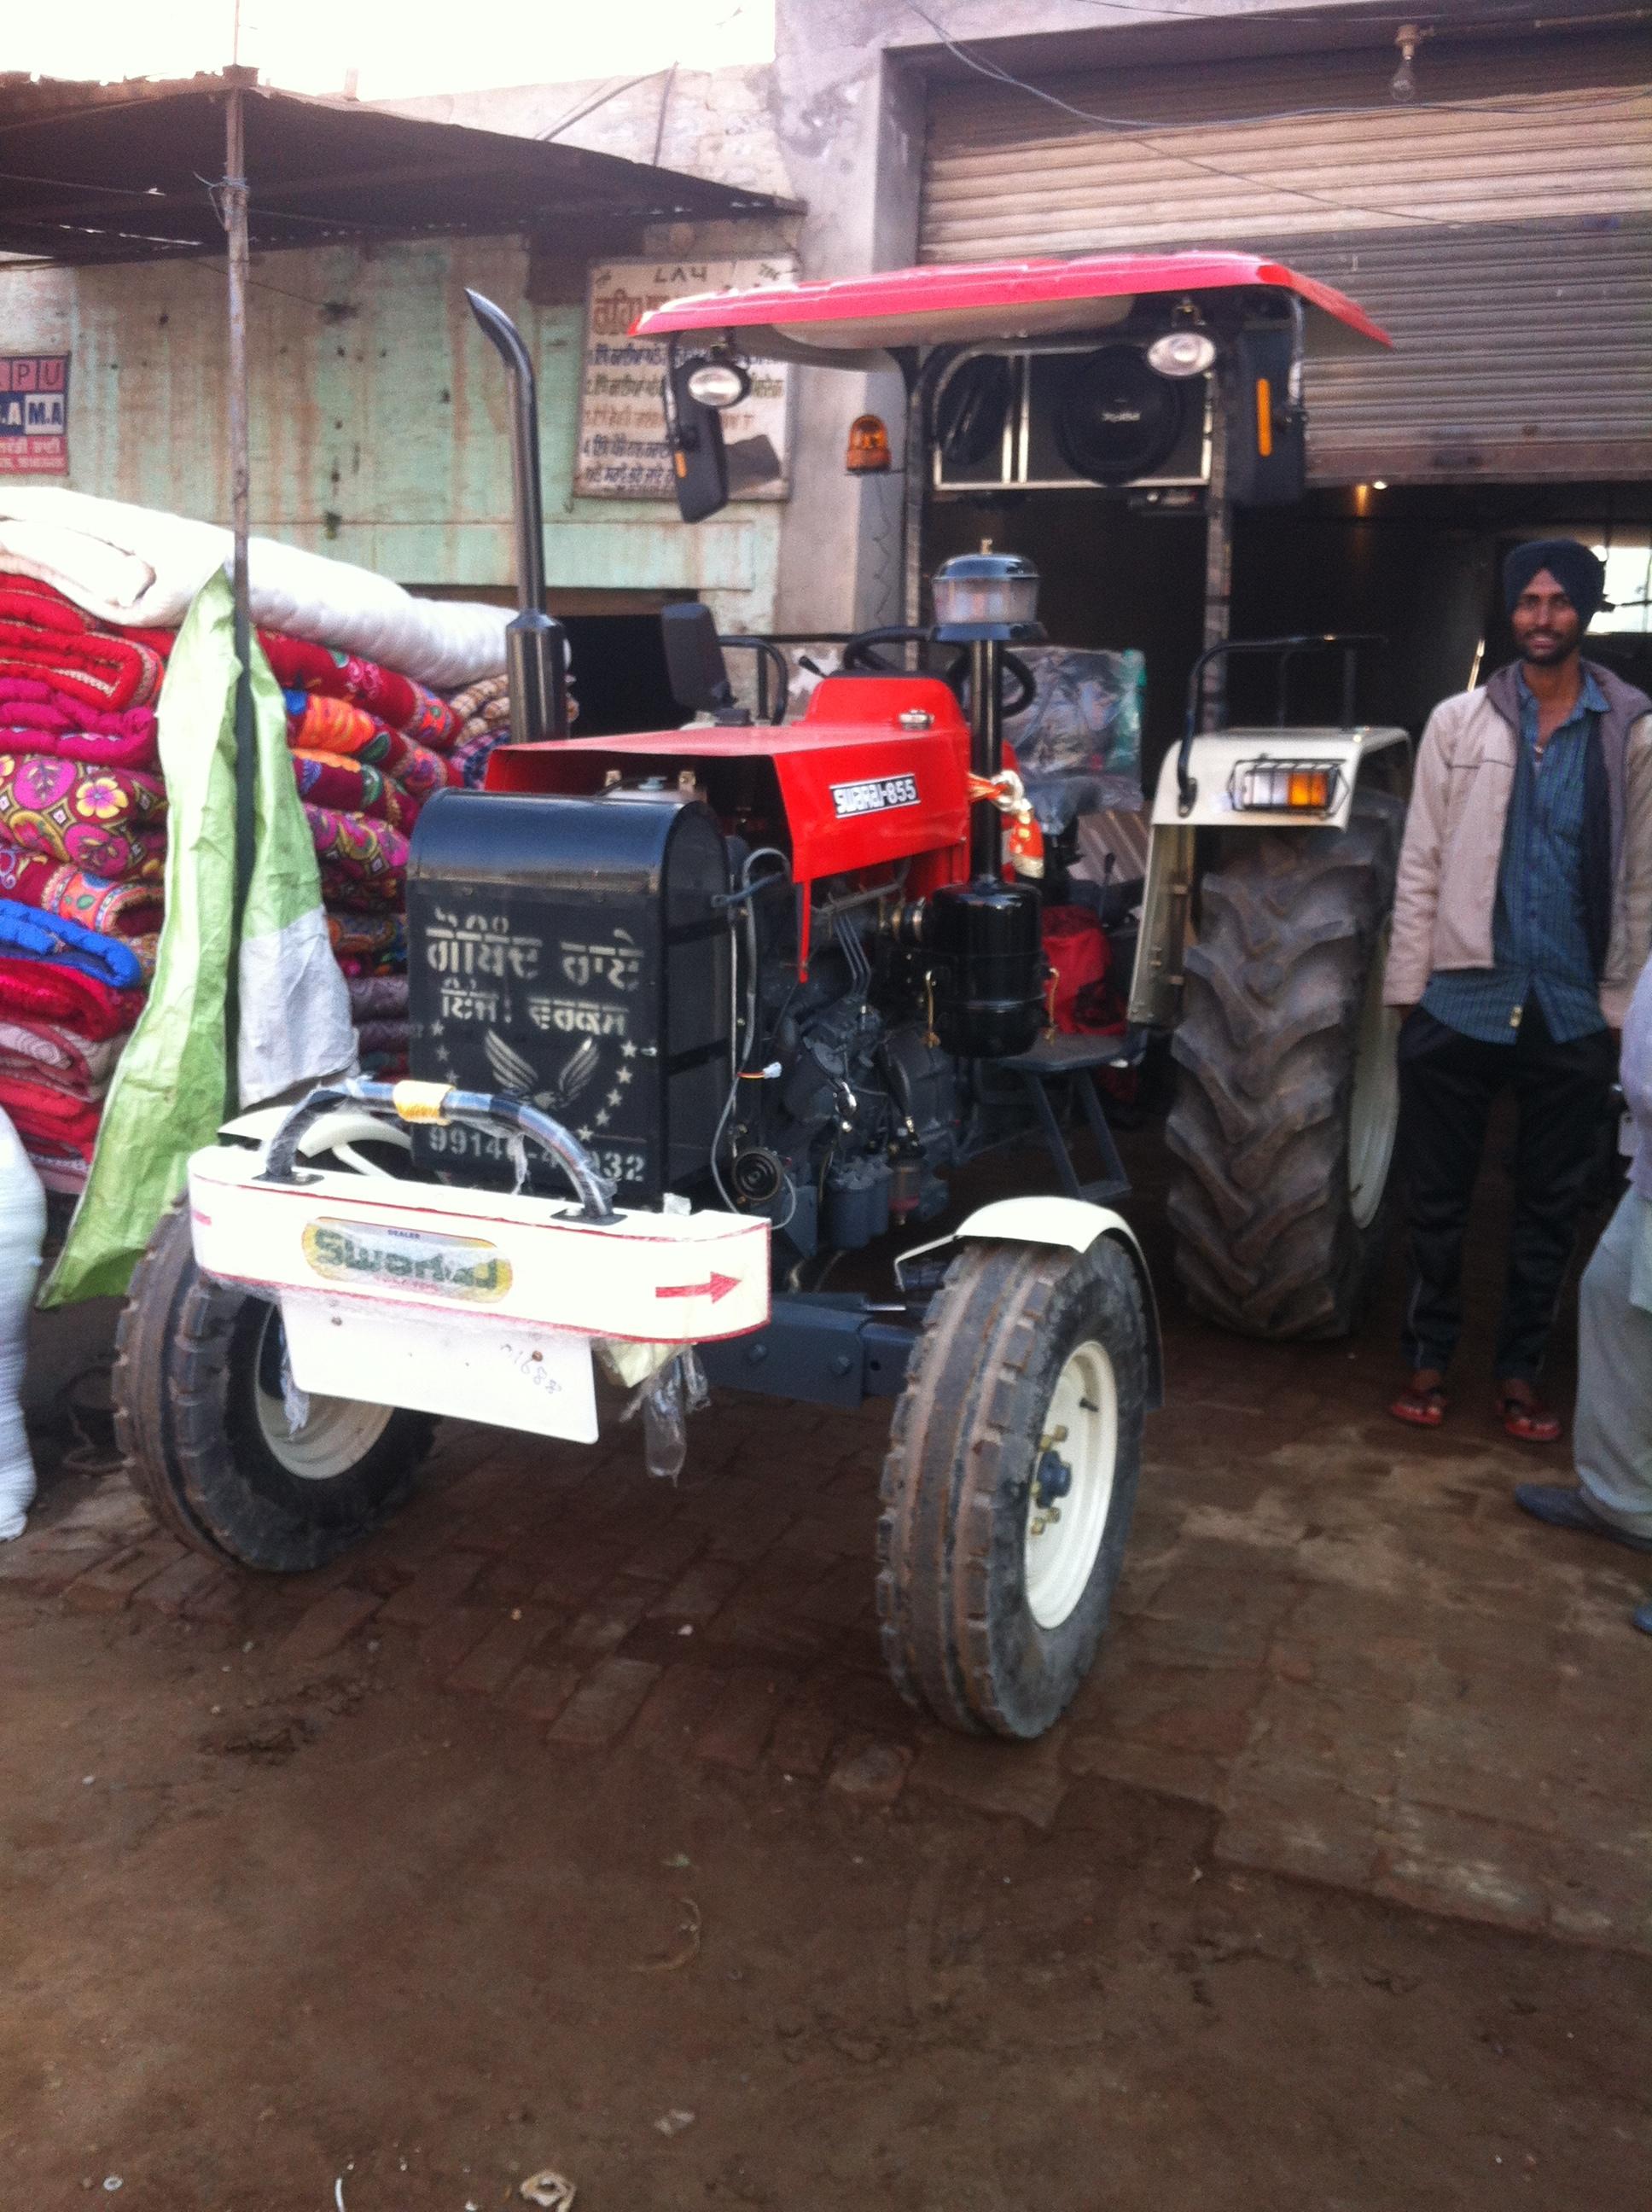 Swaraj takhar fibre hood